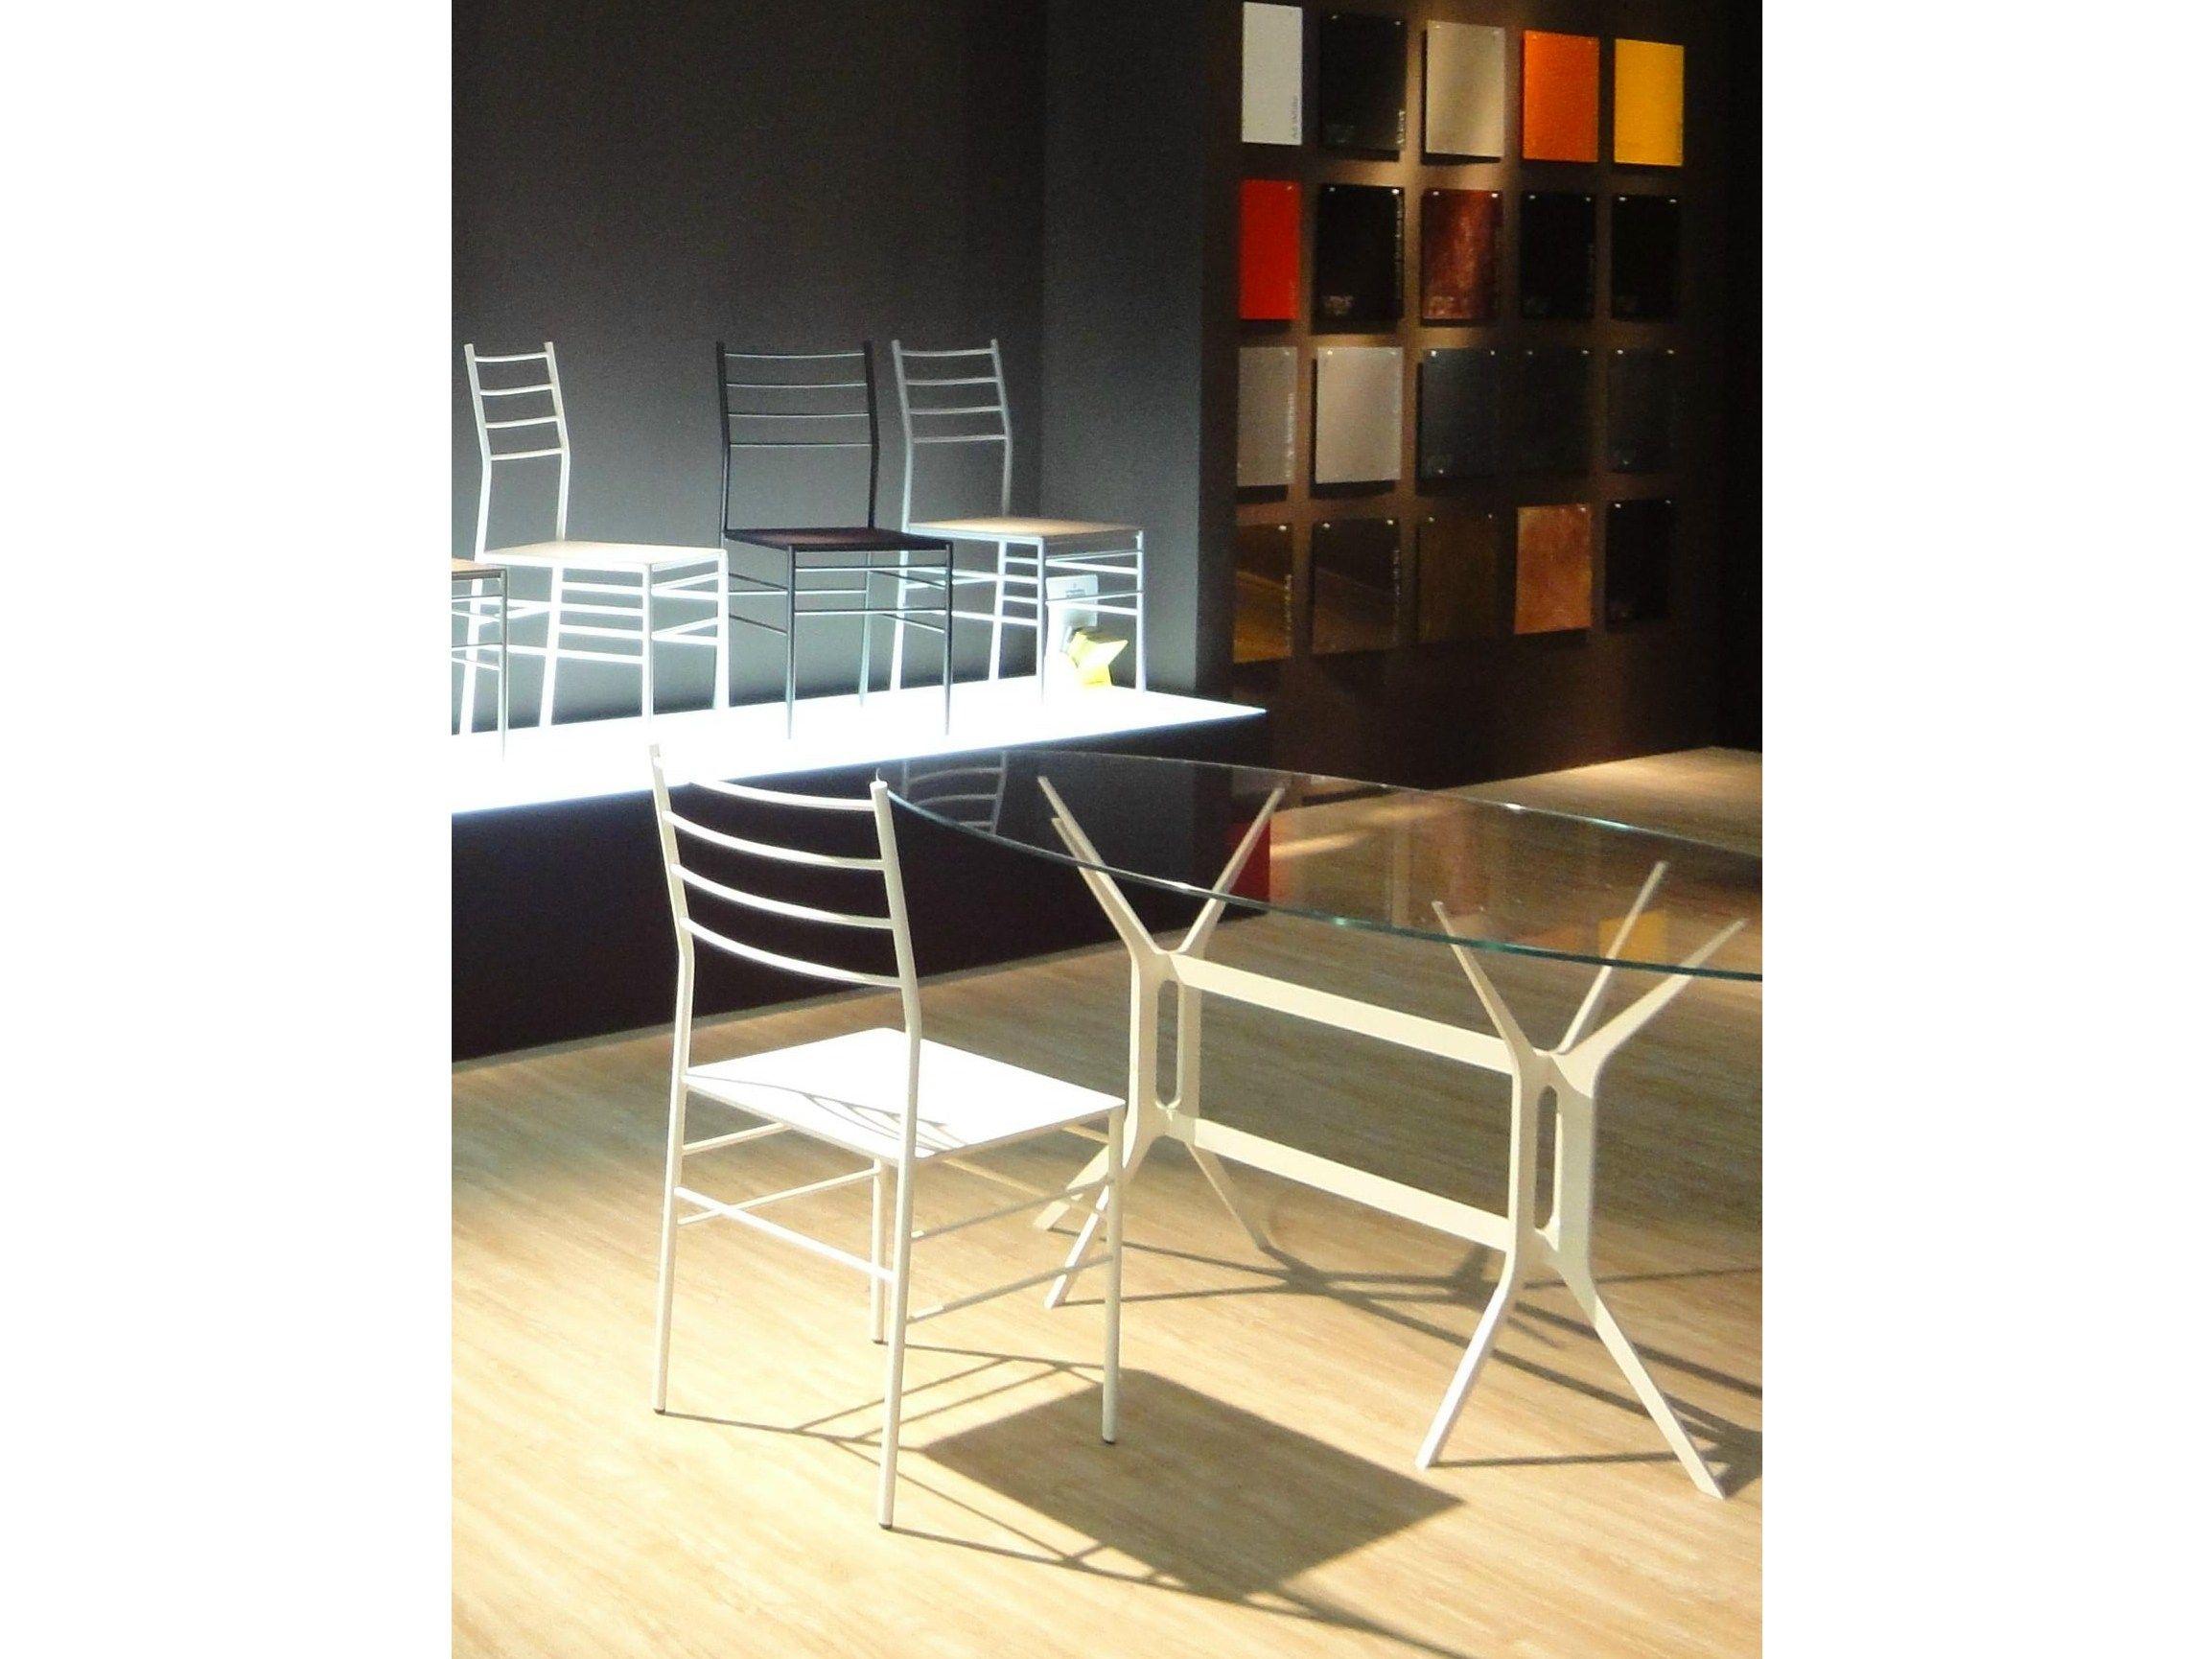 arabesque ovaler tisch by ydf design alberto basaglia. Black Bedroom Furniture Sets. Home Design Ideas